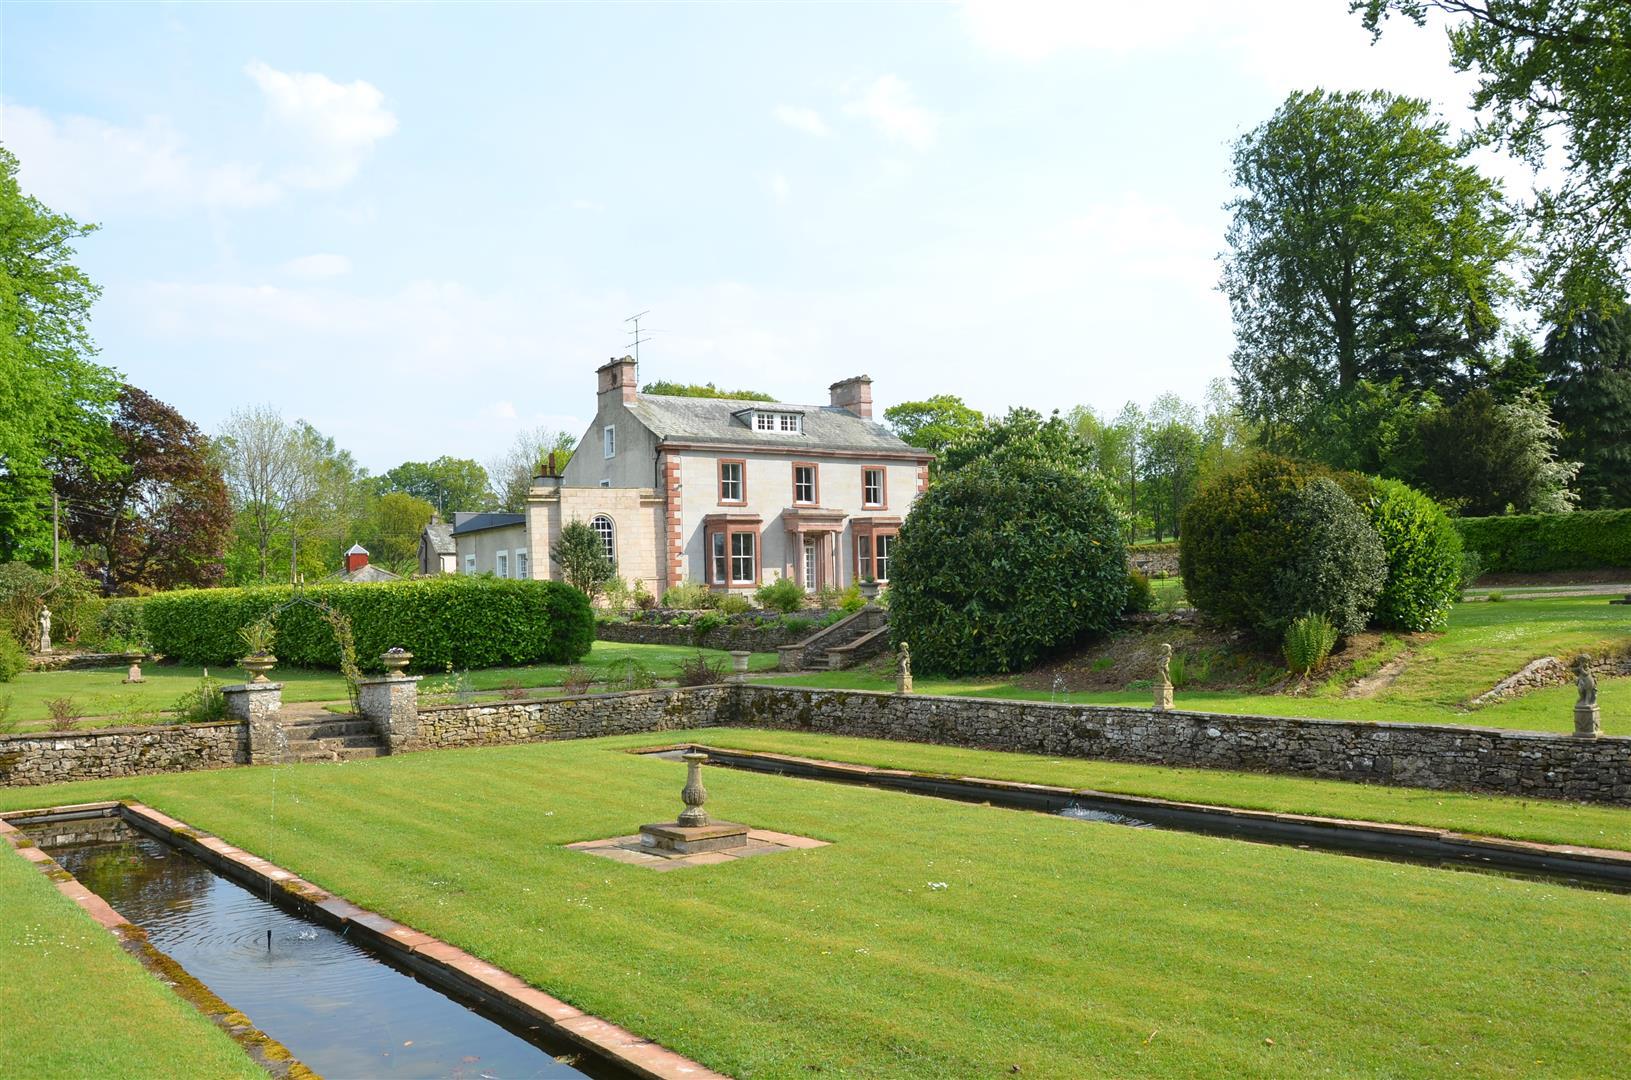 Holesfoot House, Maulds Meaburn, Penrith, Cumbria, CA10 3HX